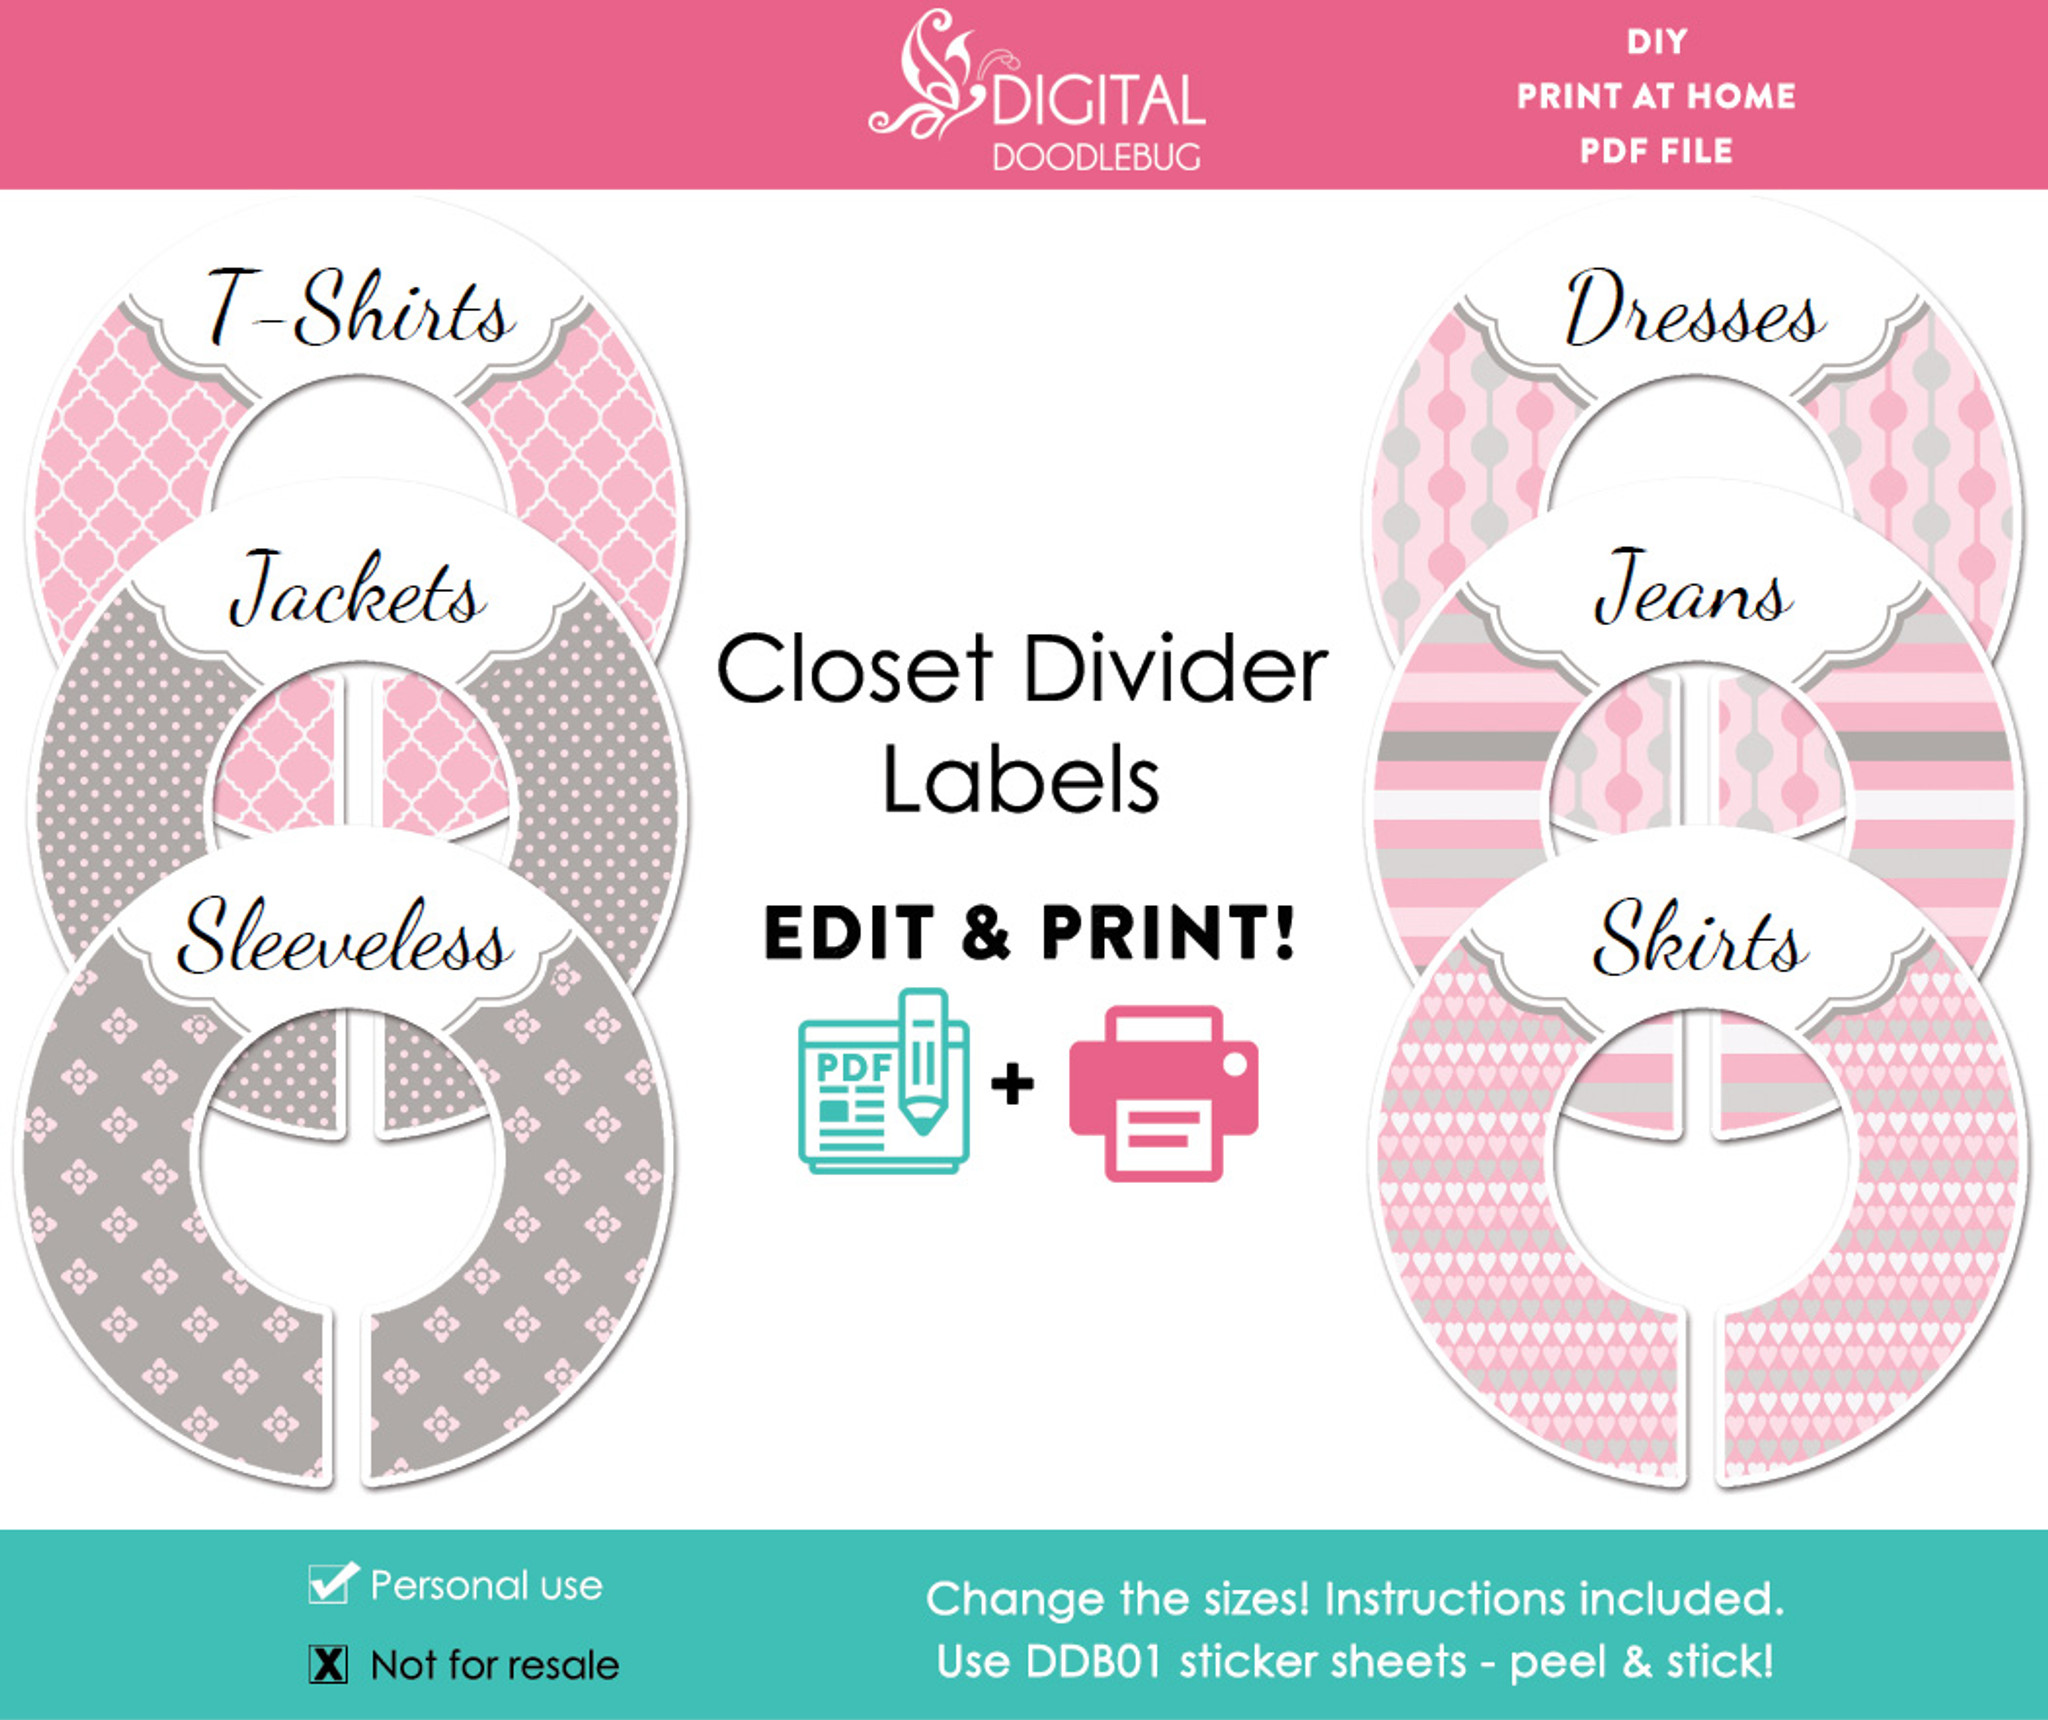 image regarding Printable Closet Dividers known as Red Grey Printable Closet Dividers